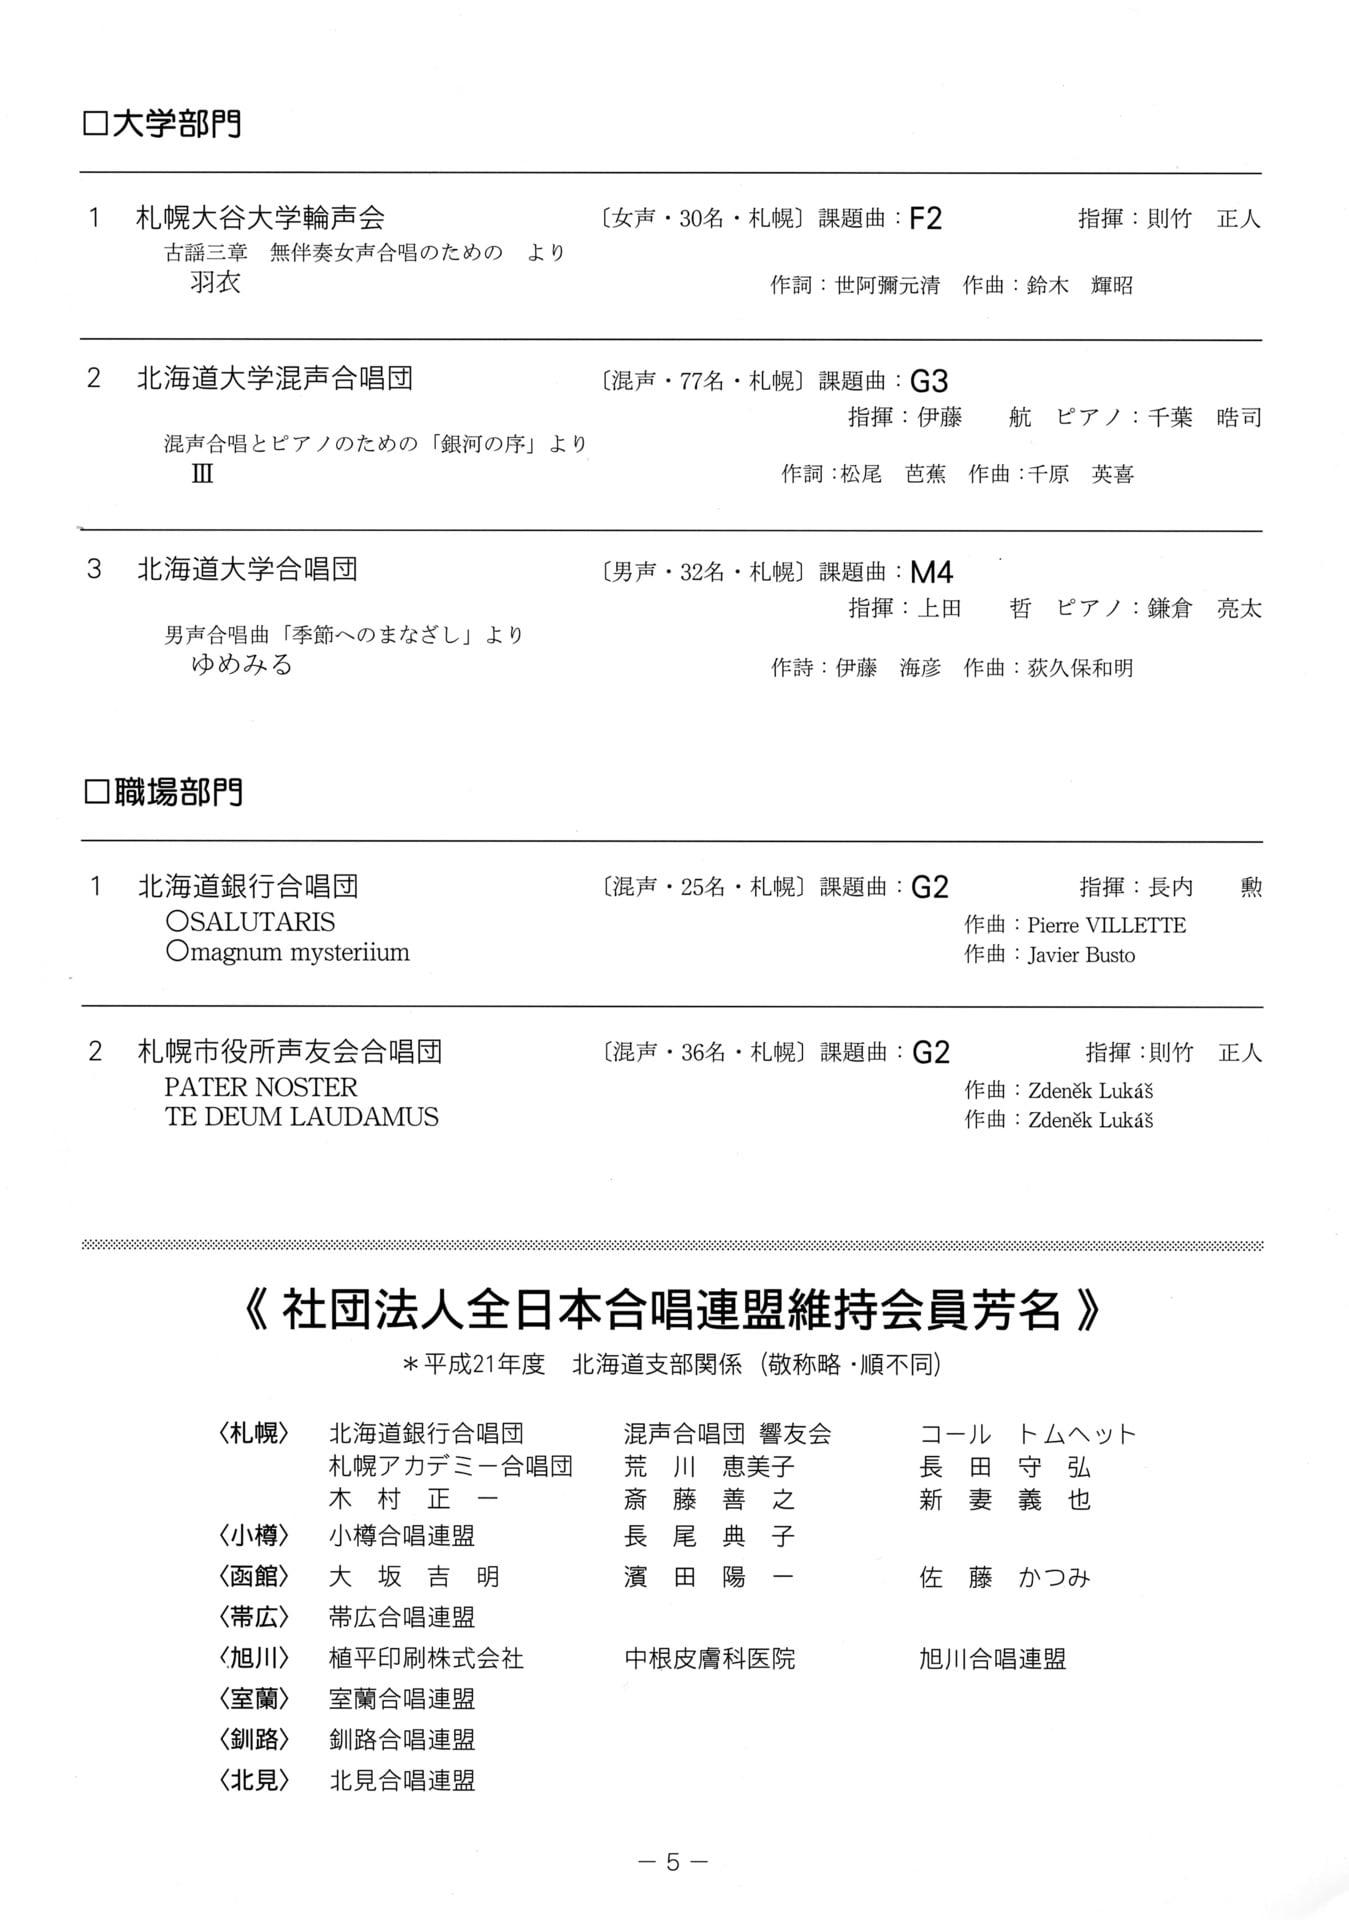 c06860df8d12c 大 学:札幌大谷大学・輪声会職 場:北海道銀行合唱団一般A:ローズクォーツアンサンブル一般B:THE GOUGE